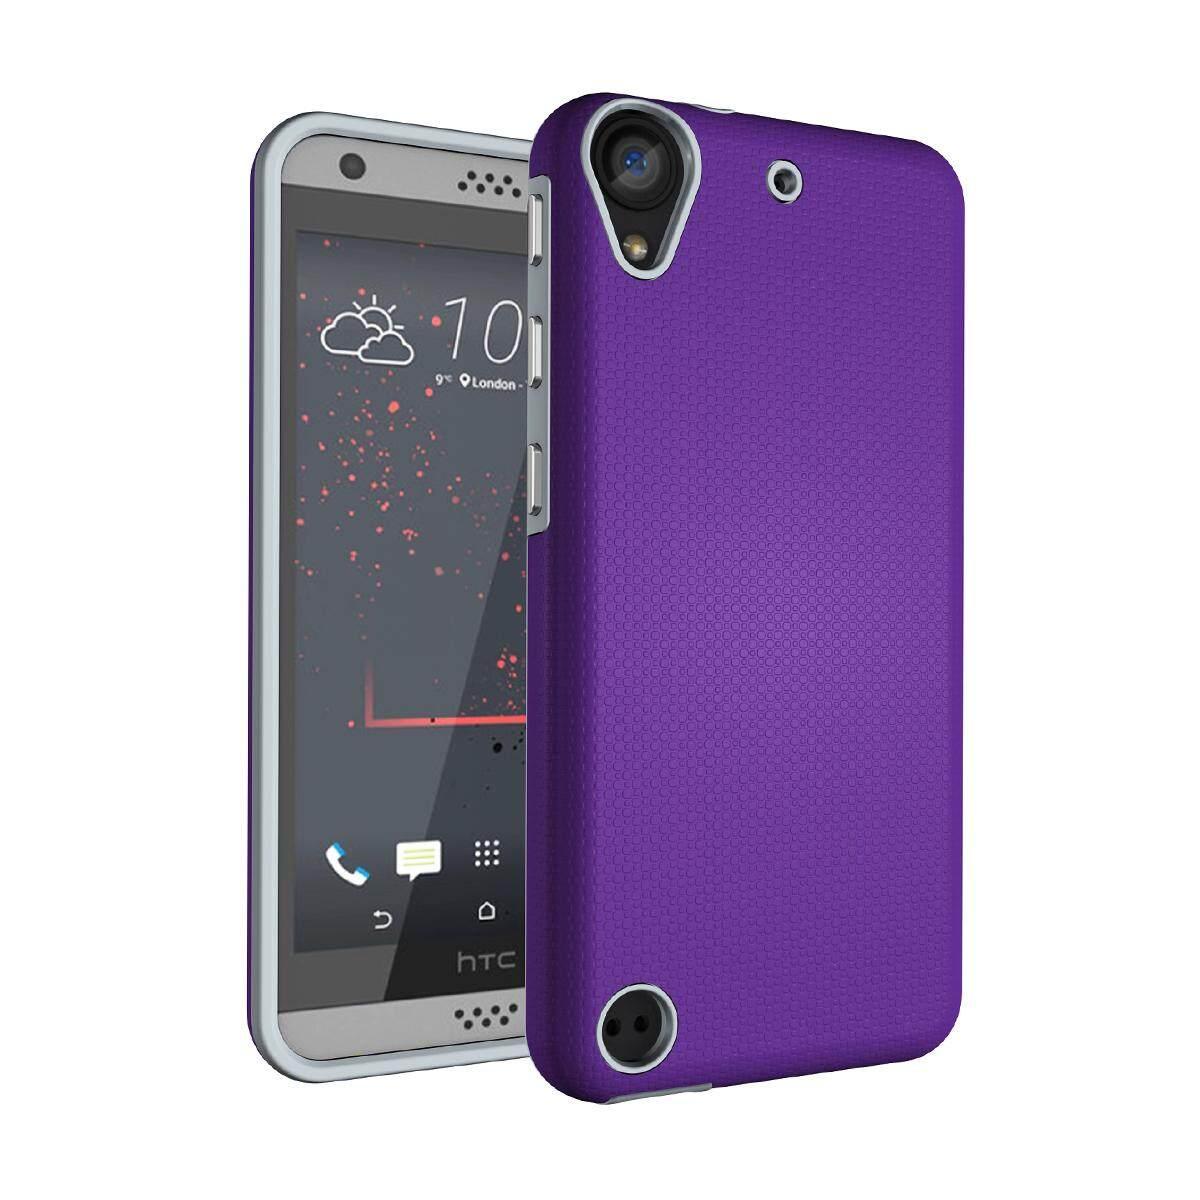 Pelindung Meishengkai untuk HTC Desire 530 Anti Slip dan Shatter Proof Hard PC + TPU 2 In 1 Protective Case Sampul Ungu-Intl